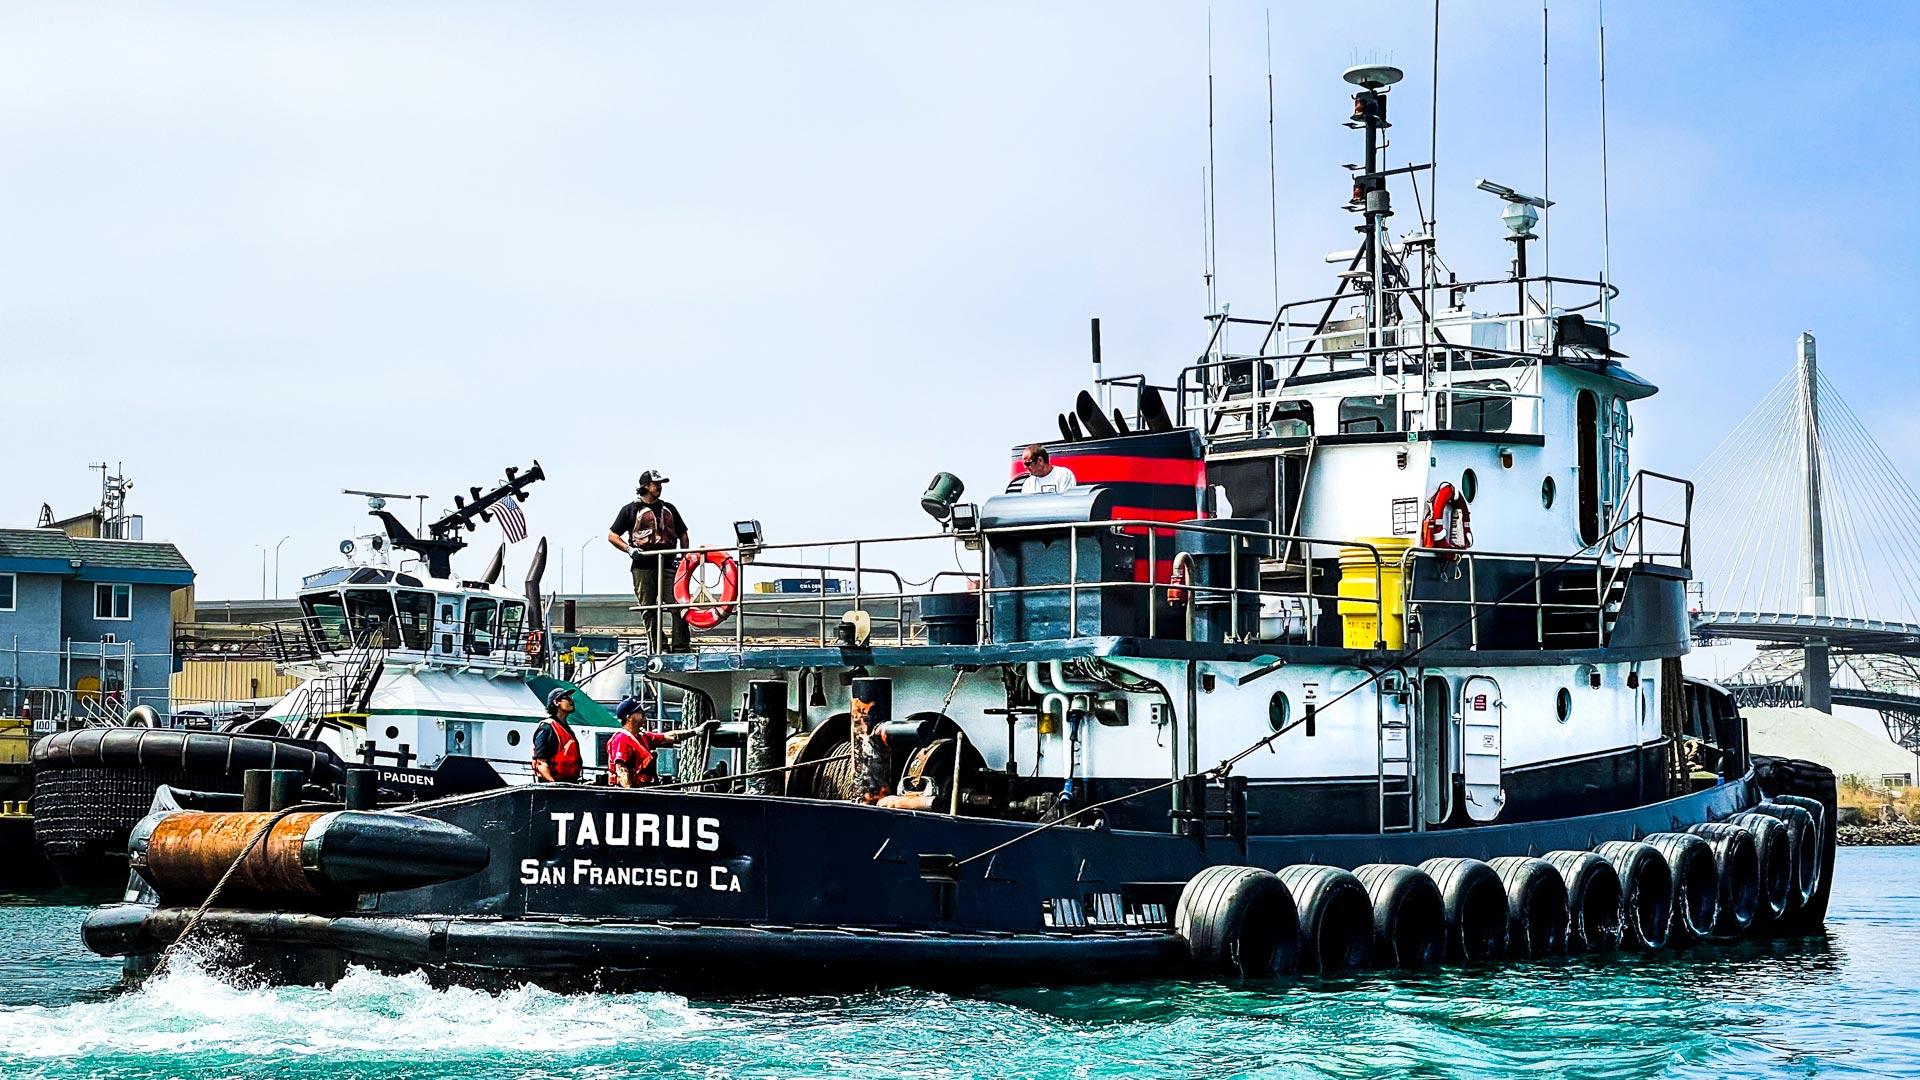 Taurus Coastal Tugboat Curtin Maritime Coastal Towing